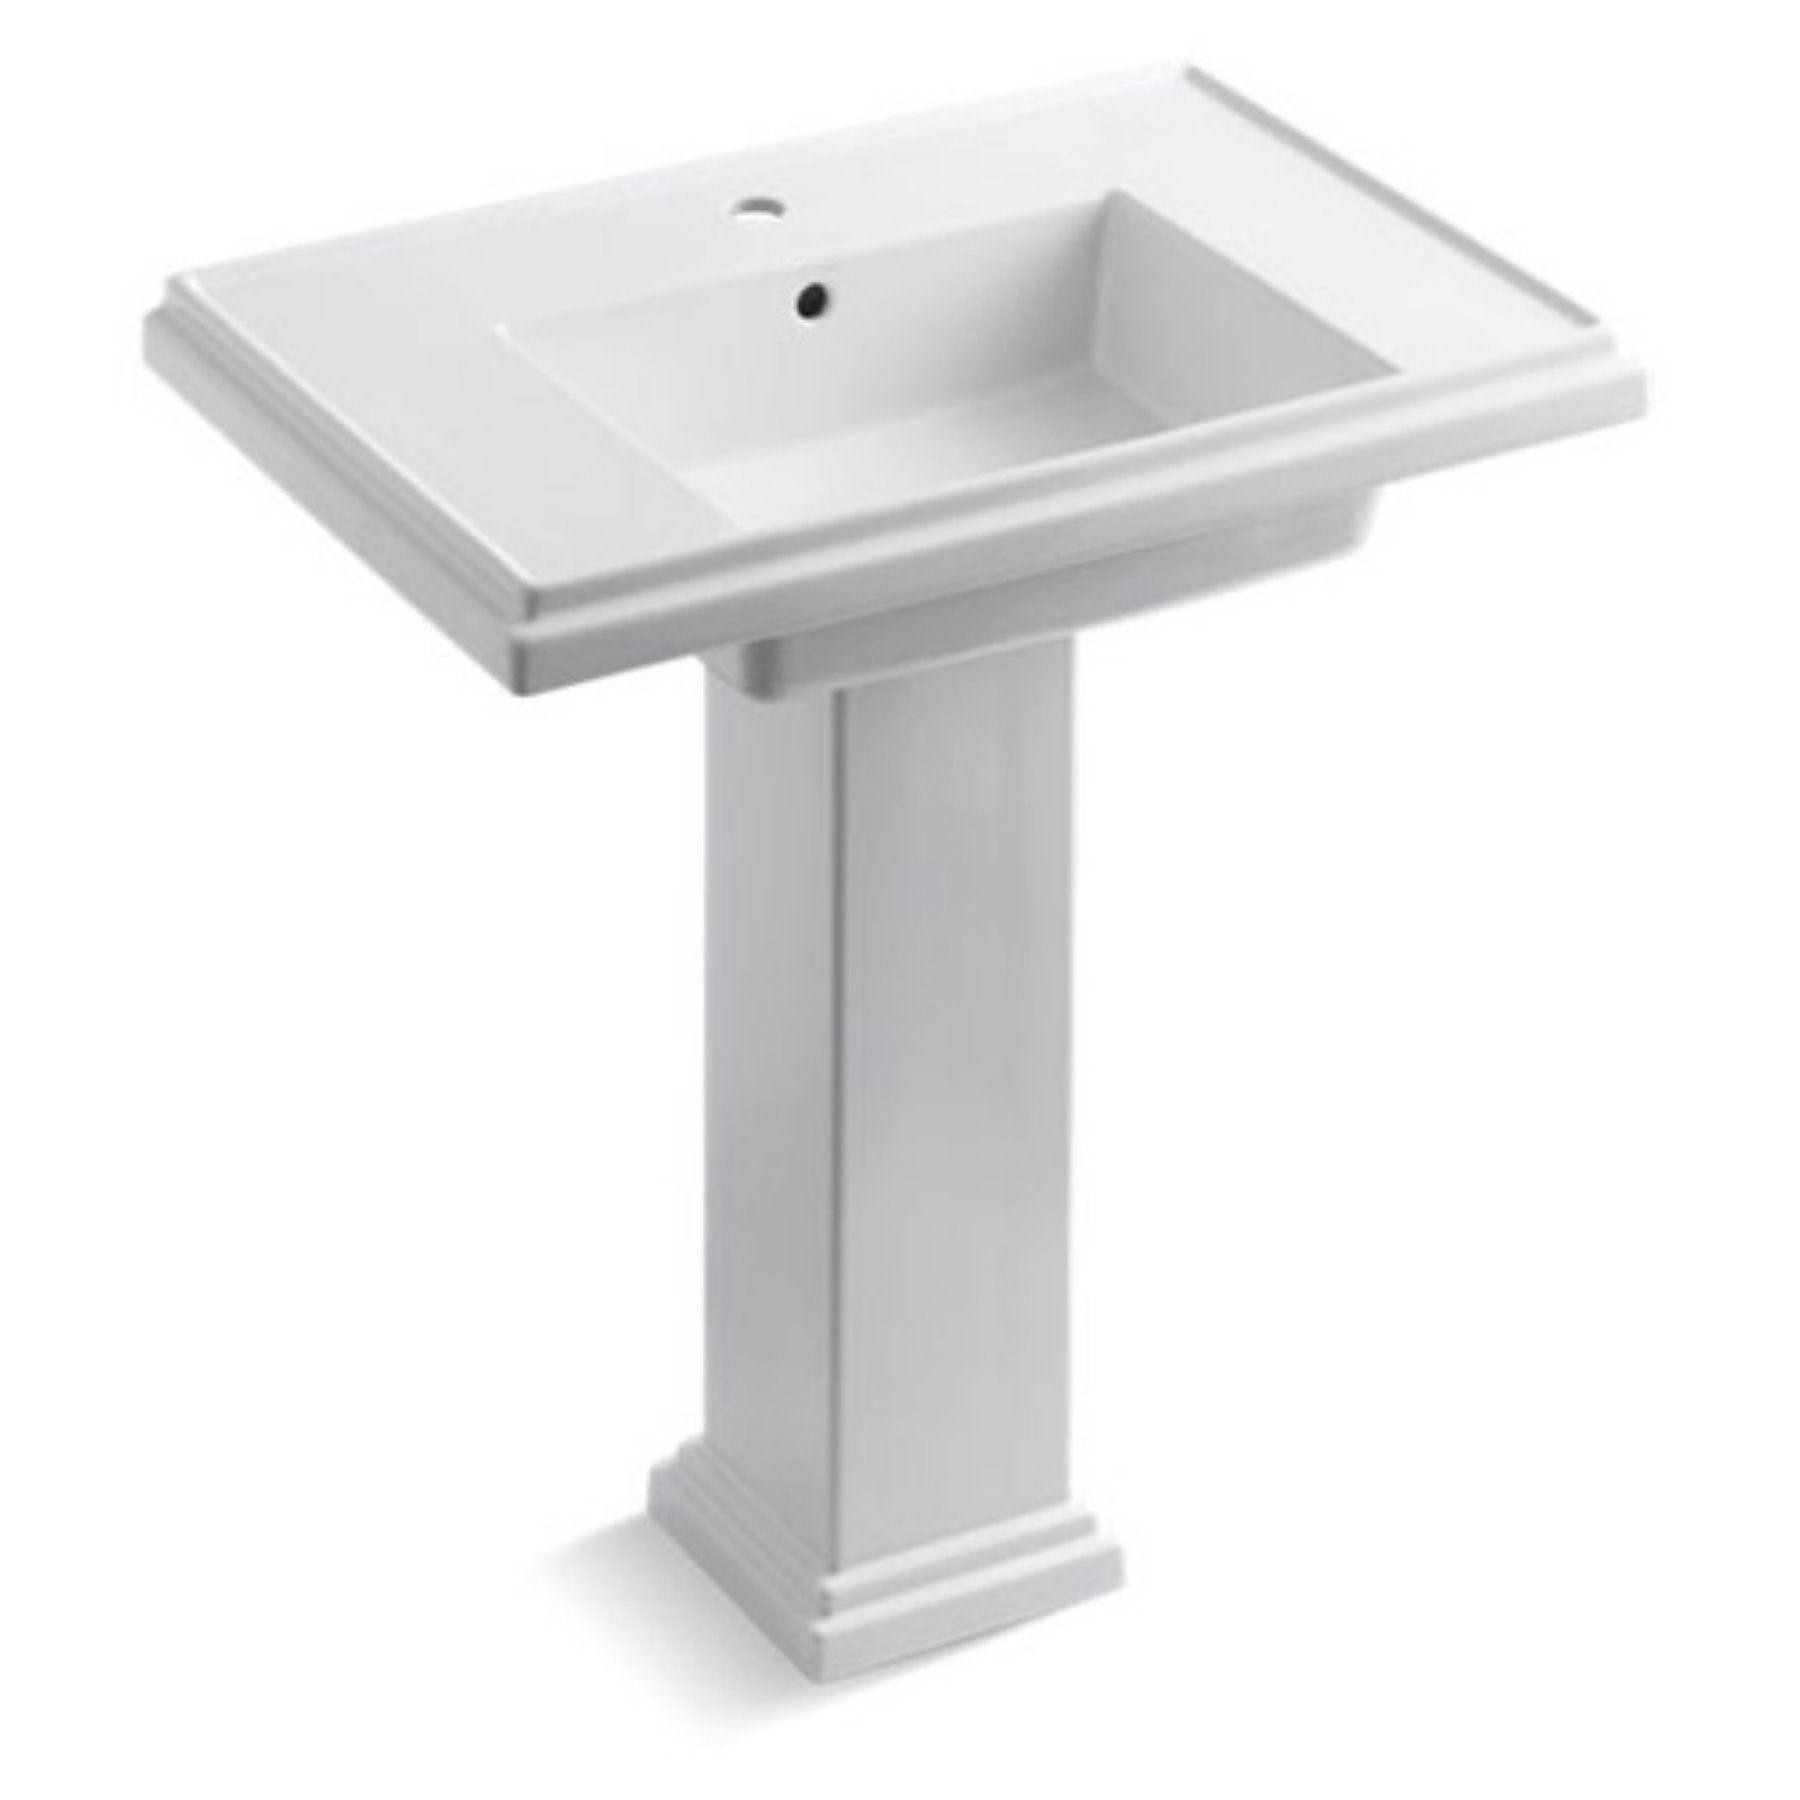 Kohler Tresham Koh2845 30 In Pedestal Bathroom Sink Pedestal